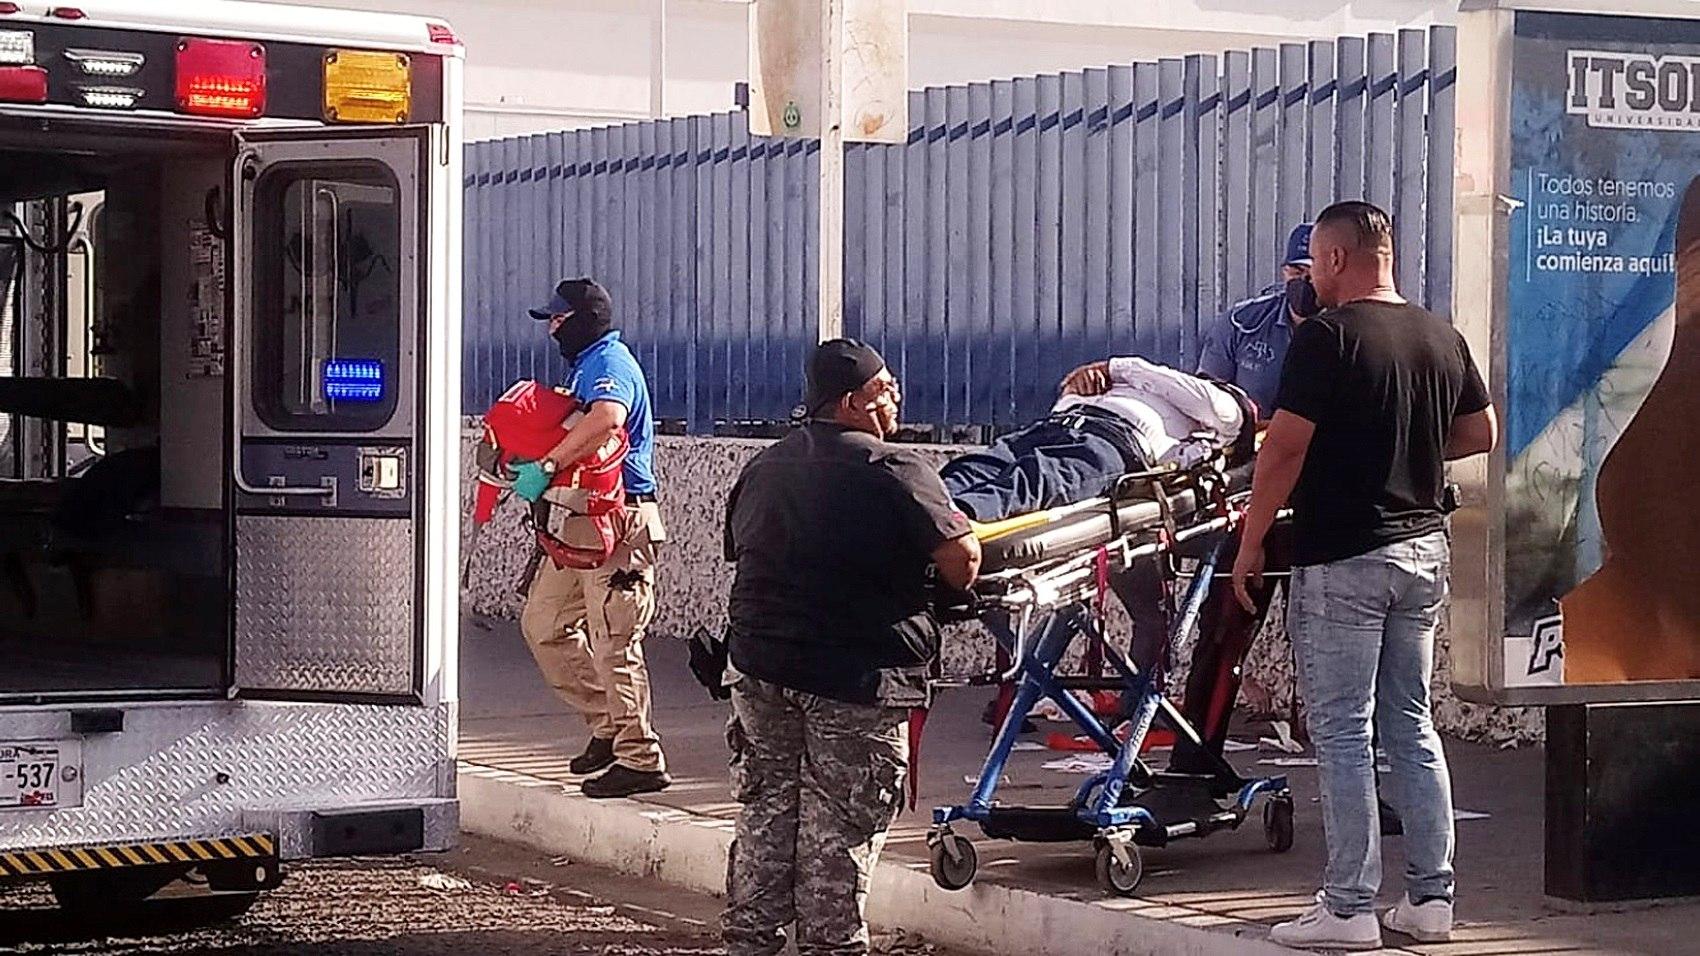 Traslado de Abel Murrieta a un hospital tras ser disparado.